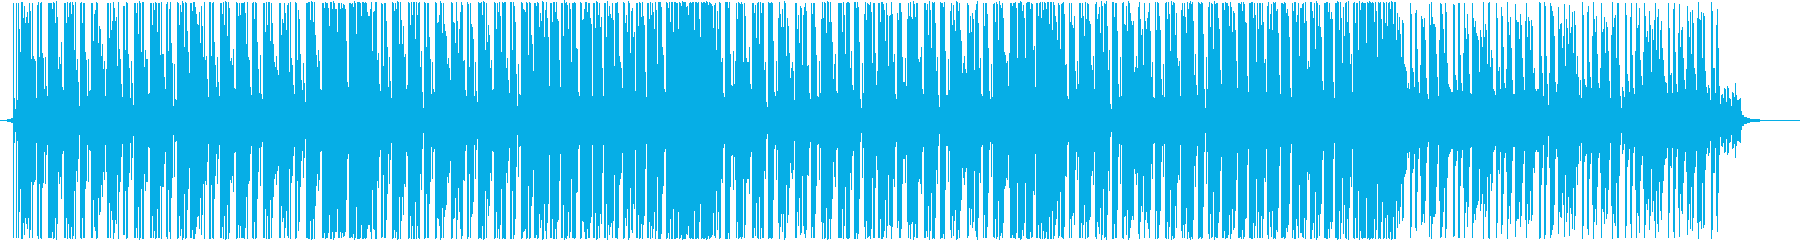 Kawaii系Future Bass 4の再生済みの波形